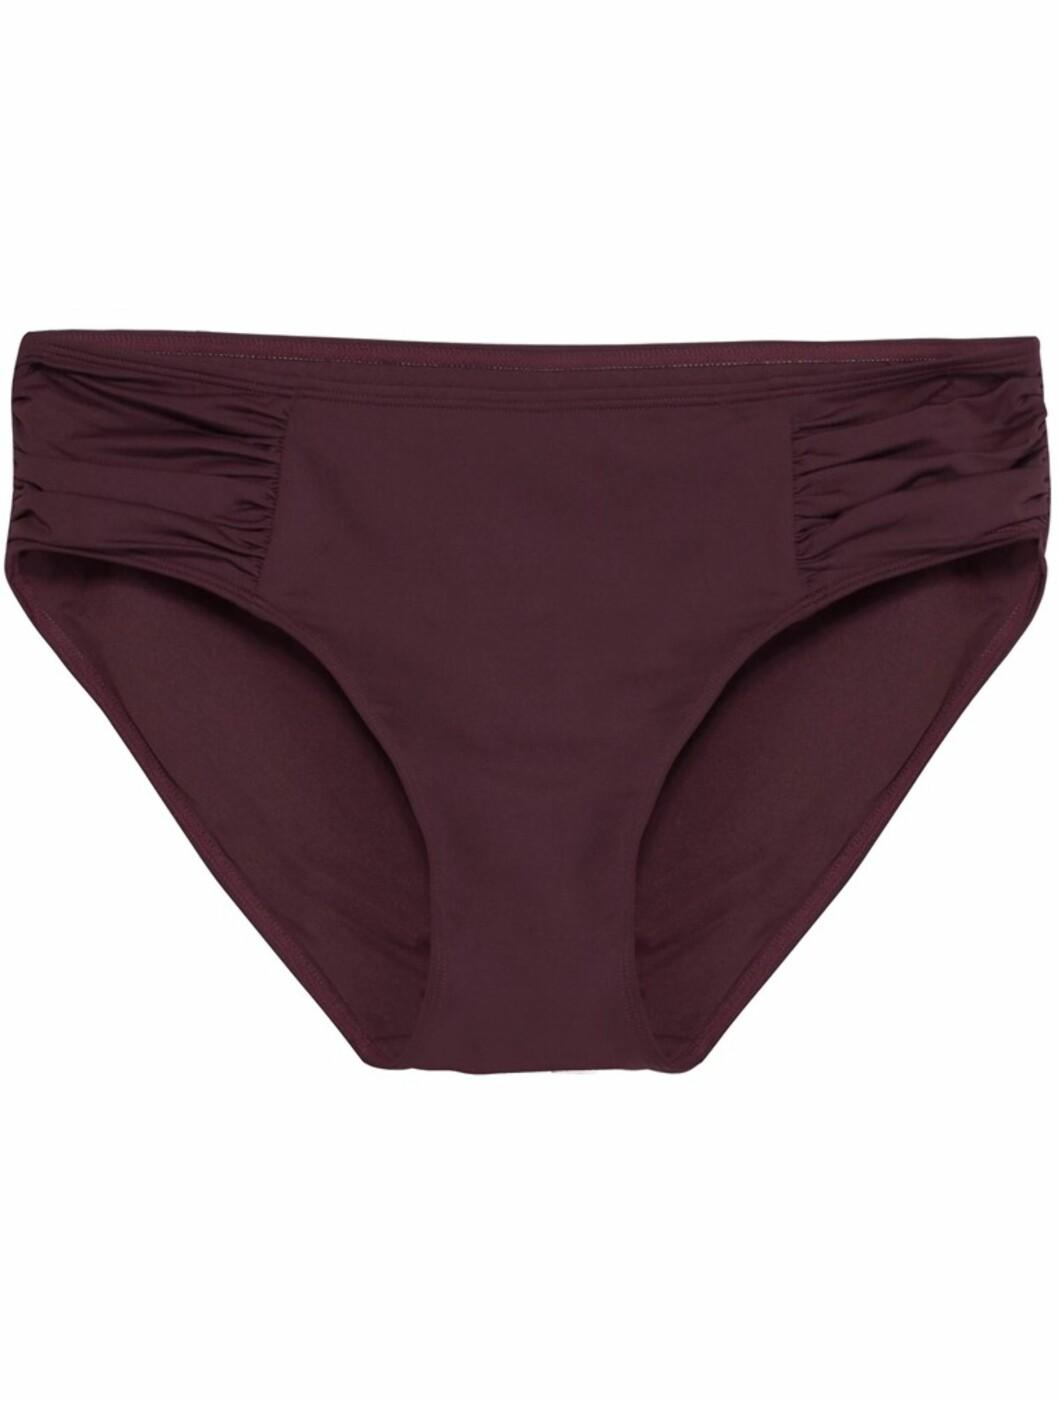 <strong>Bikinitruse fra Kappahl  129,-  https:</strong>//www.kappahl.com/nn-no/dame/Badetoy/bikinier/bikinitruse/123943